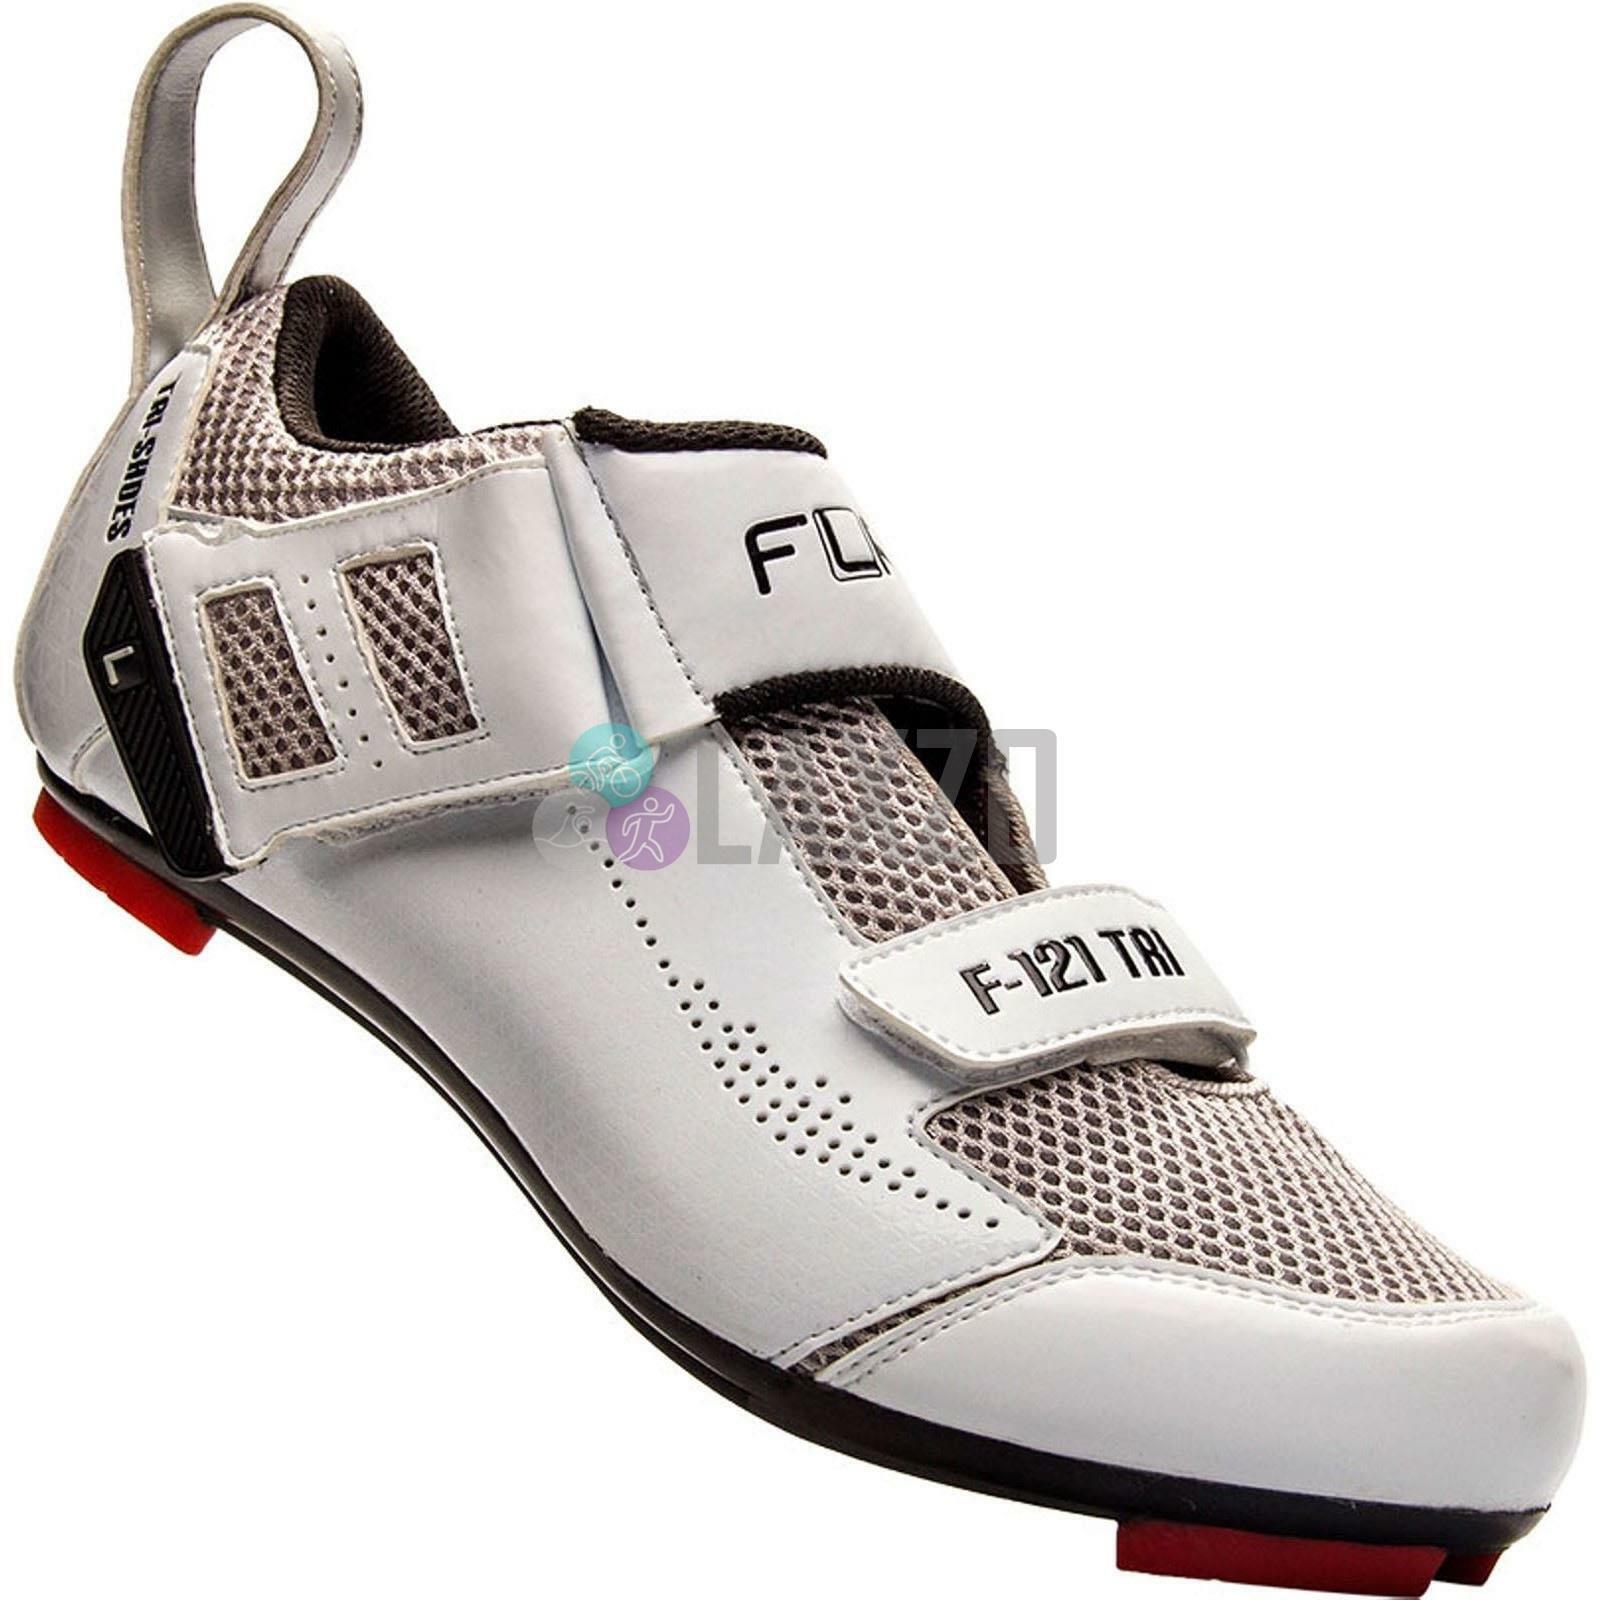 Cycling FLR F-121 Triathlon zapatos MTB and Road Bike  Talla 43 in blanco  venta de ofertas